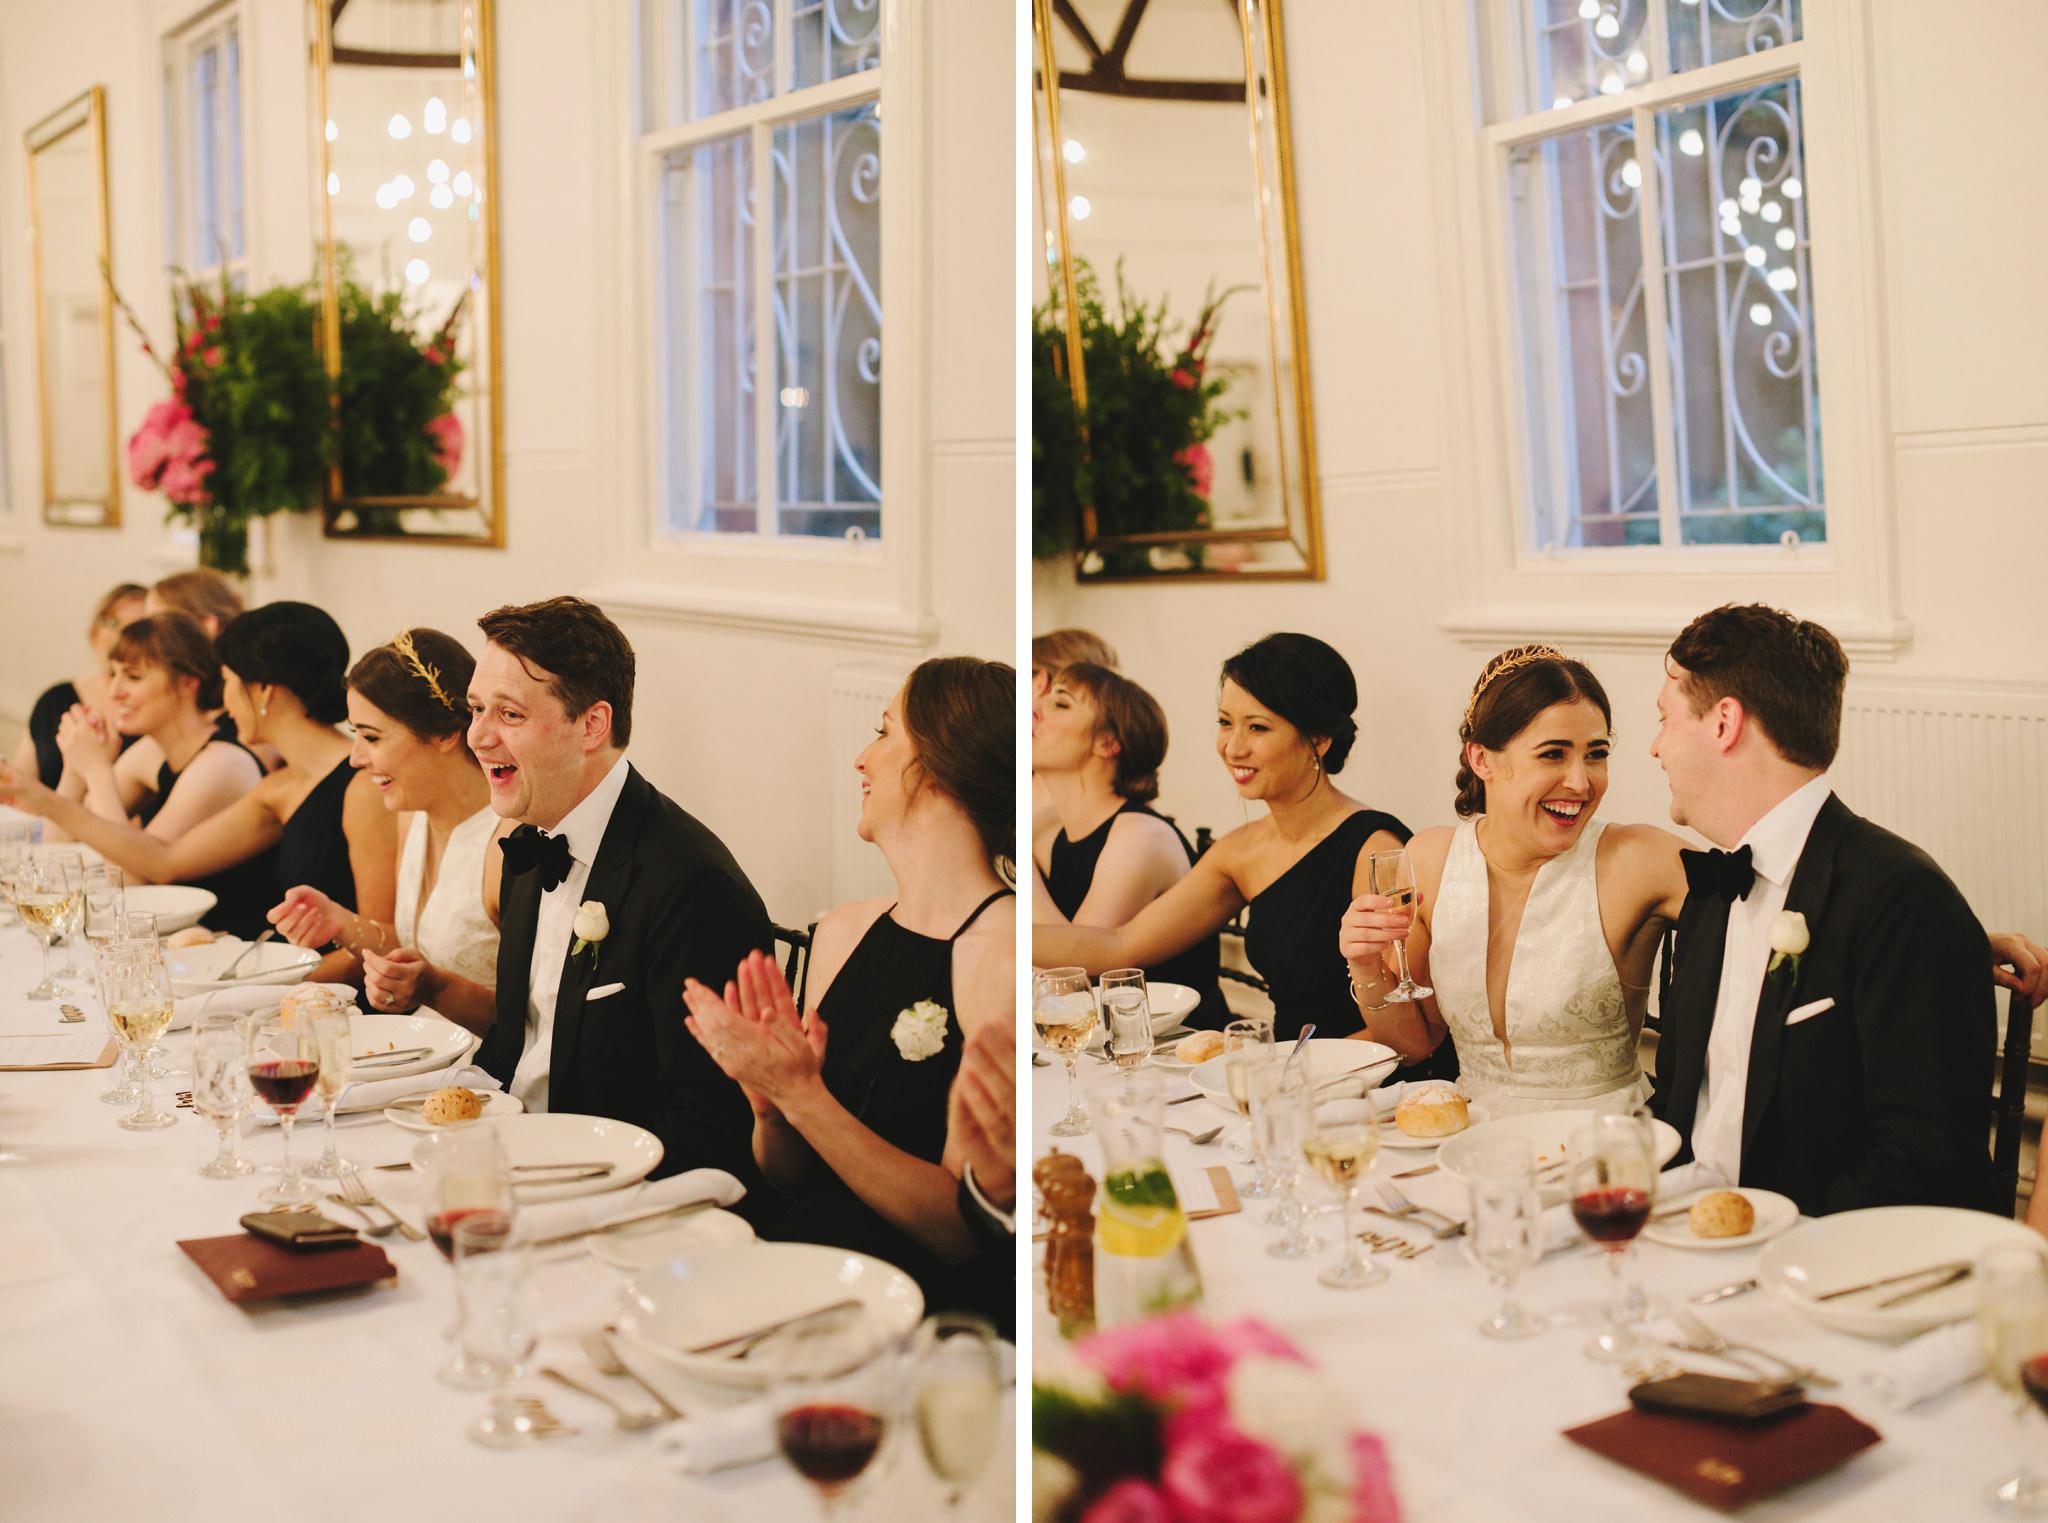 Abbotsford_Convent_Wedding_Peter_Anna107.JPG